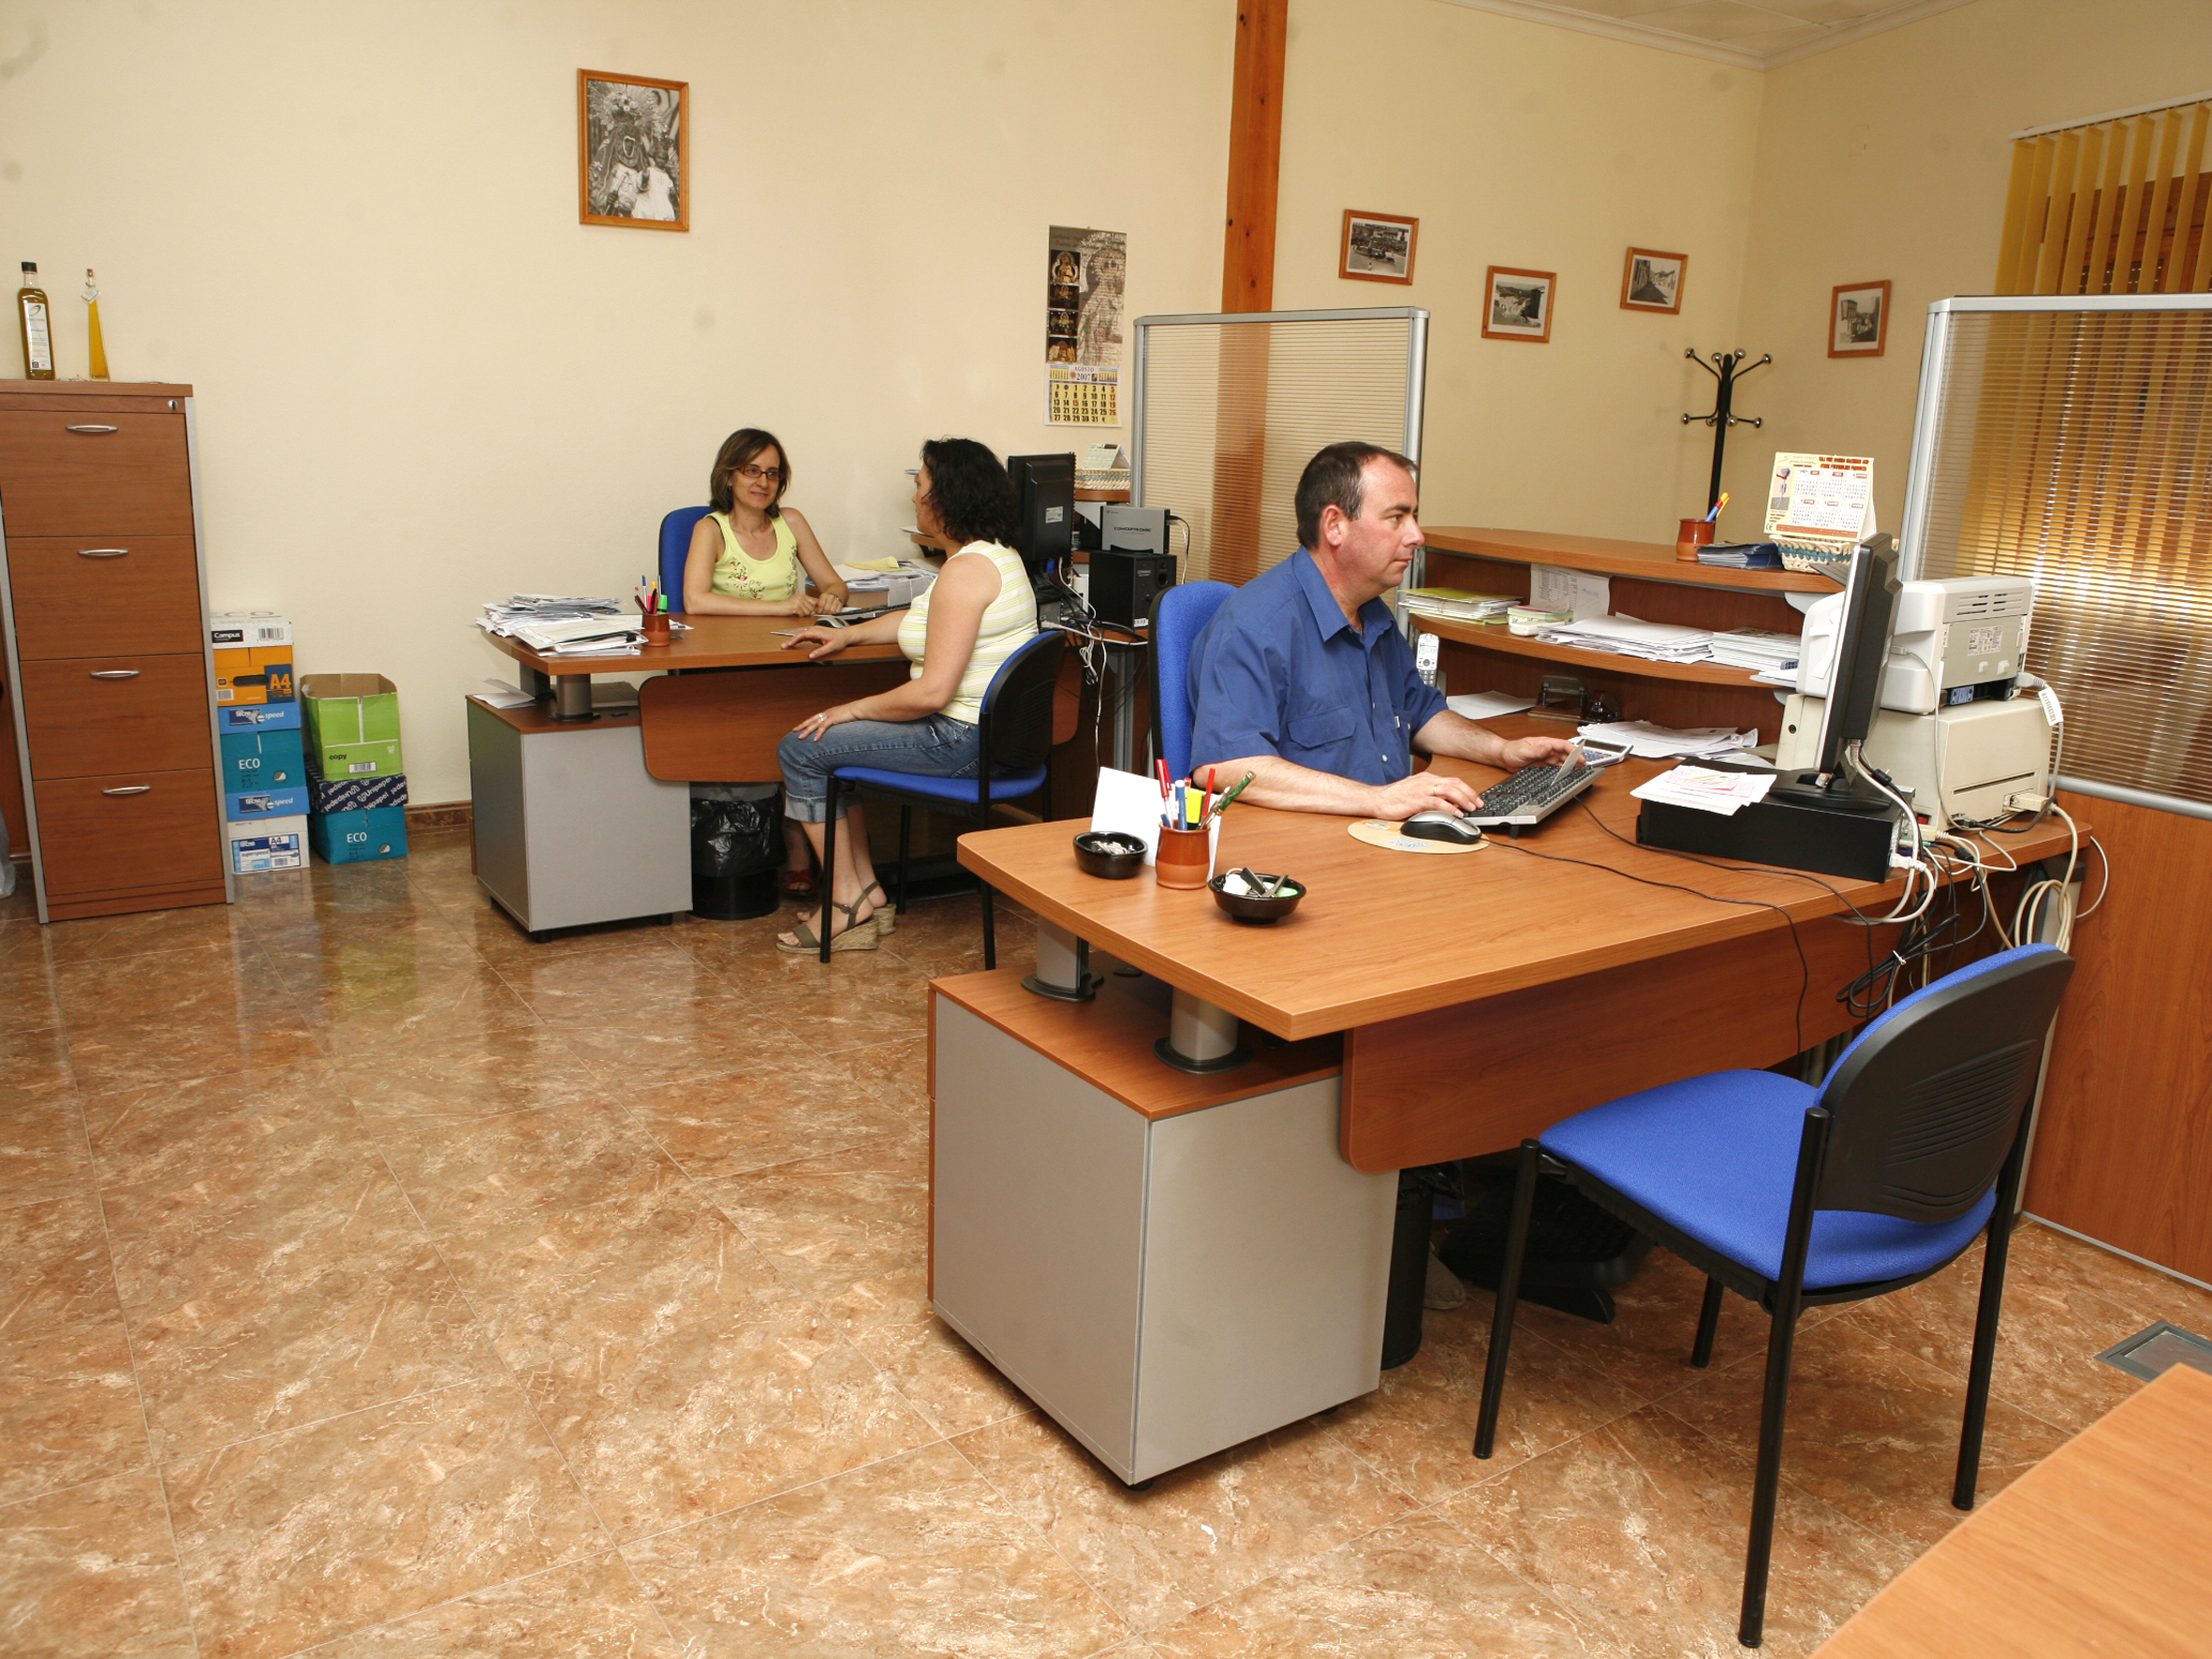 Oficina S.C.A. Santa Clotilde